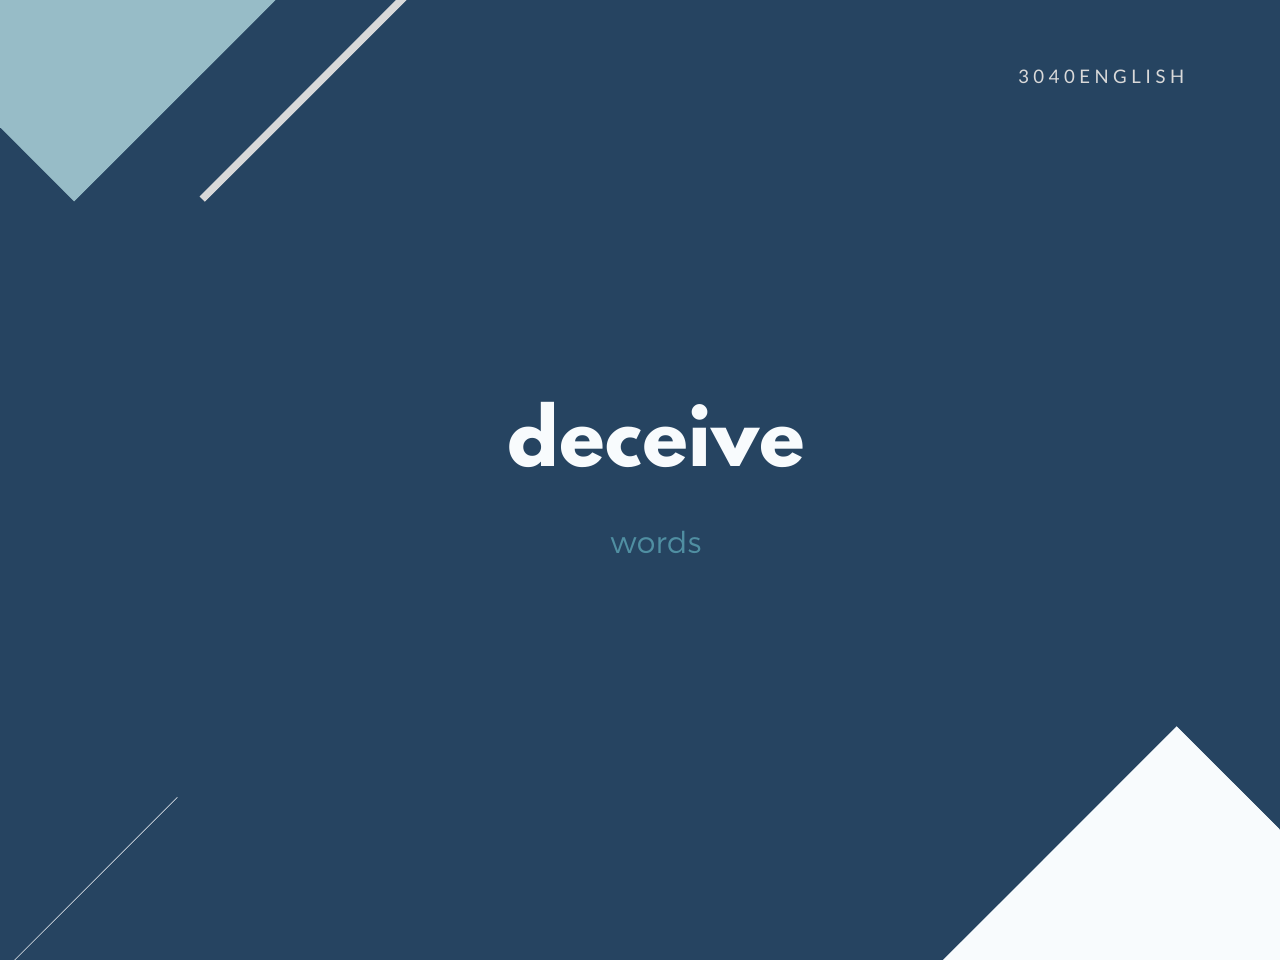 deceive の意味と簡単な使い方【音読用例文あり】